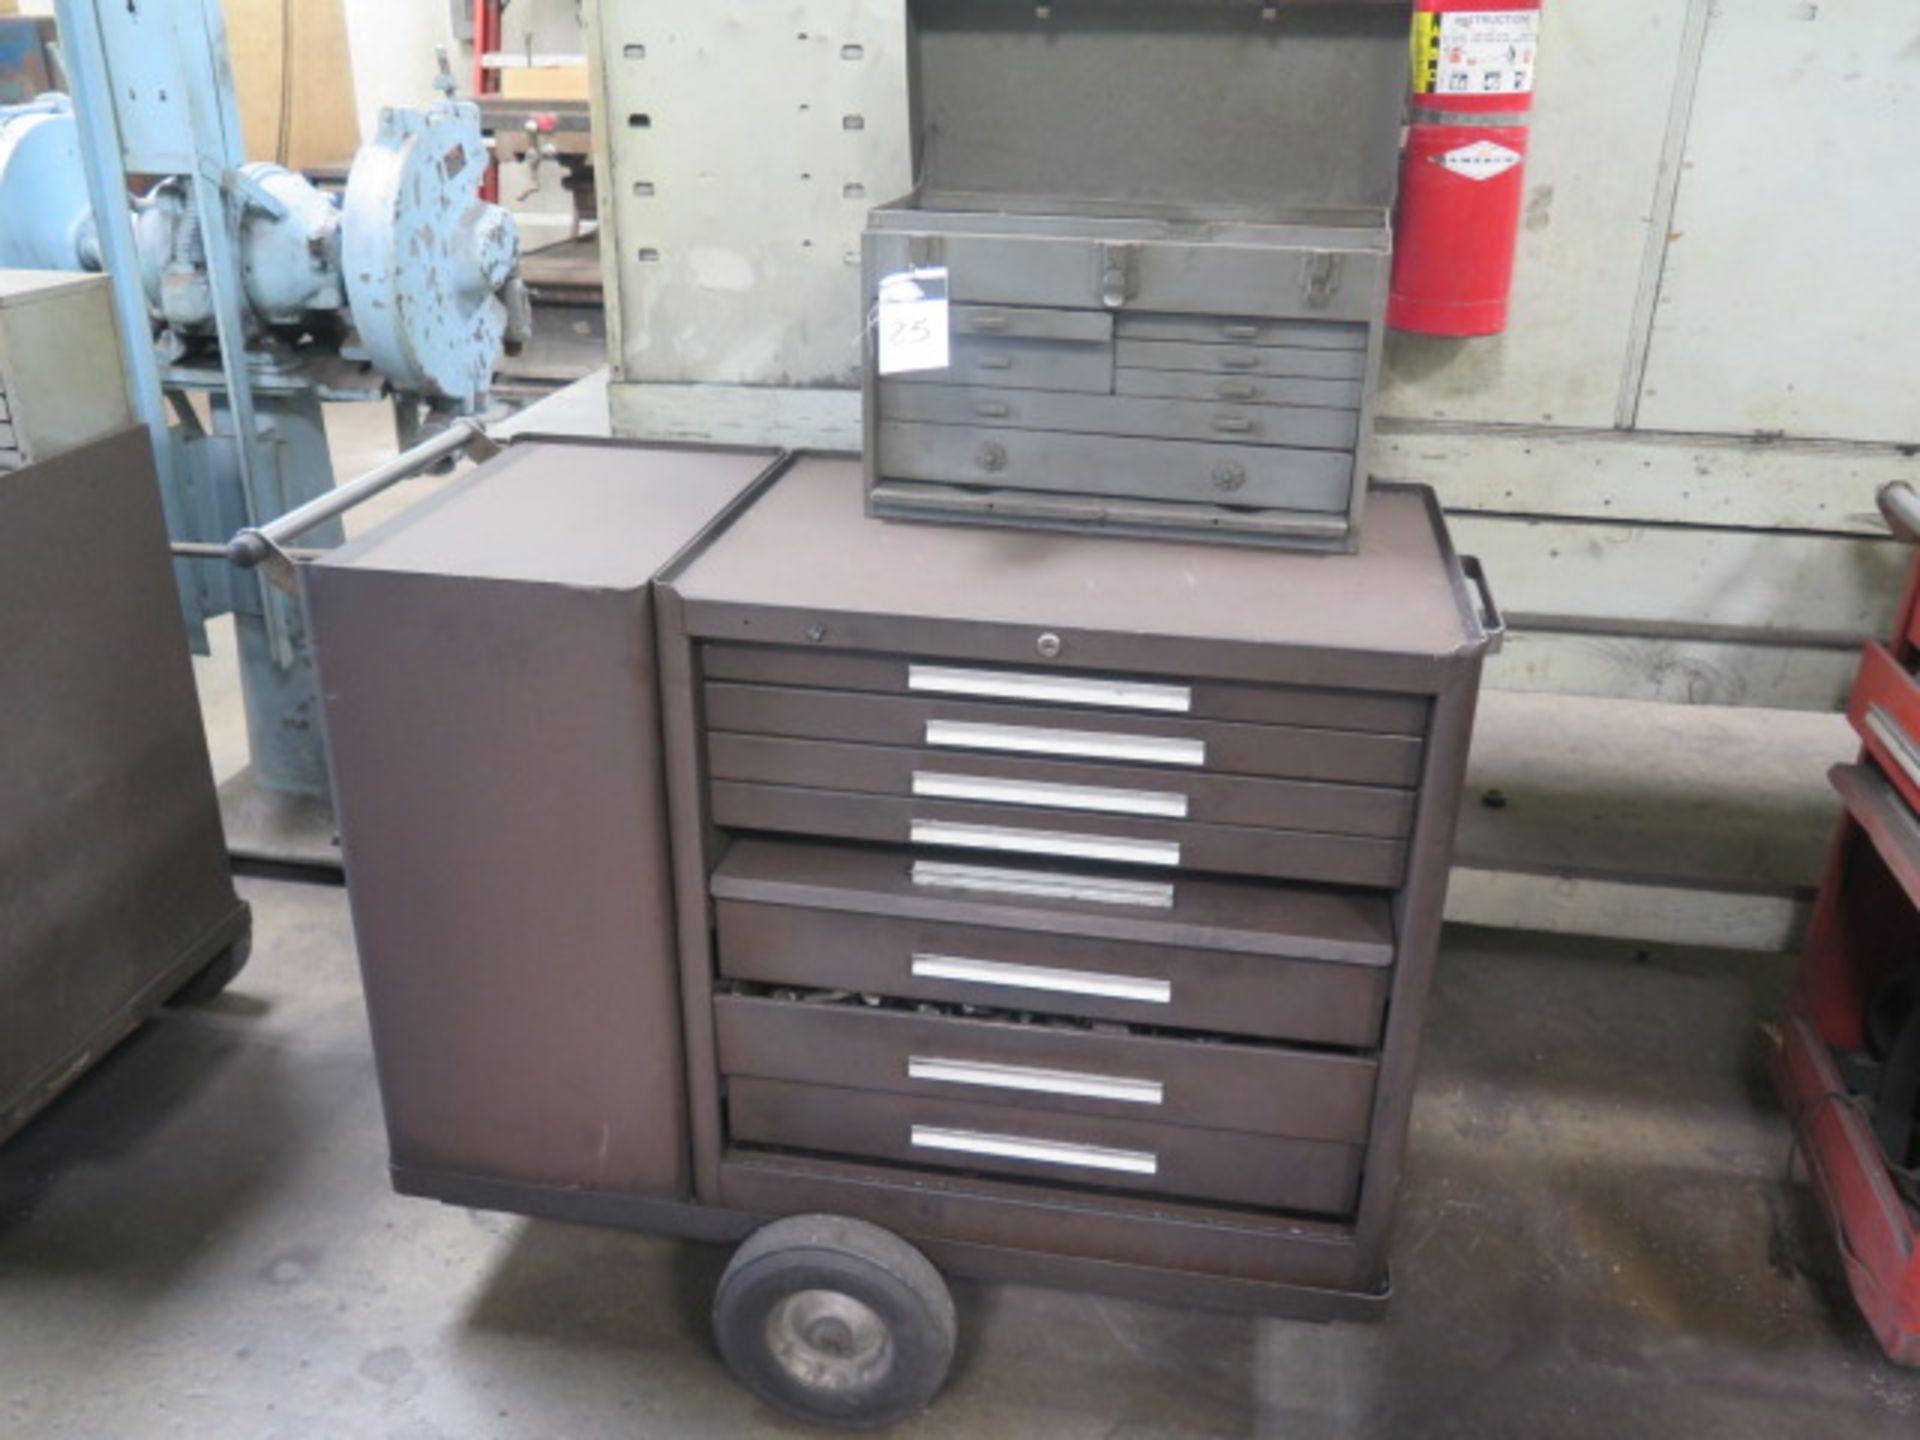 Kennedy Versa-Cart Roll-A-Way Tool Mox w/ Misc